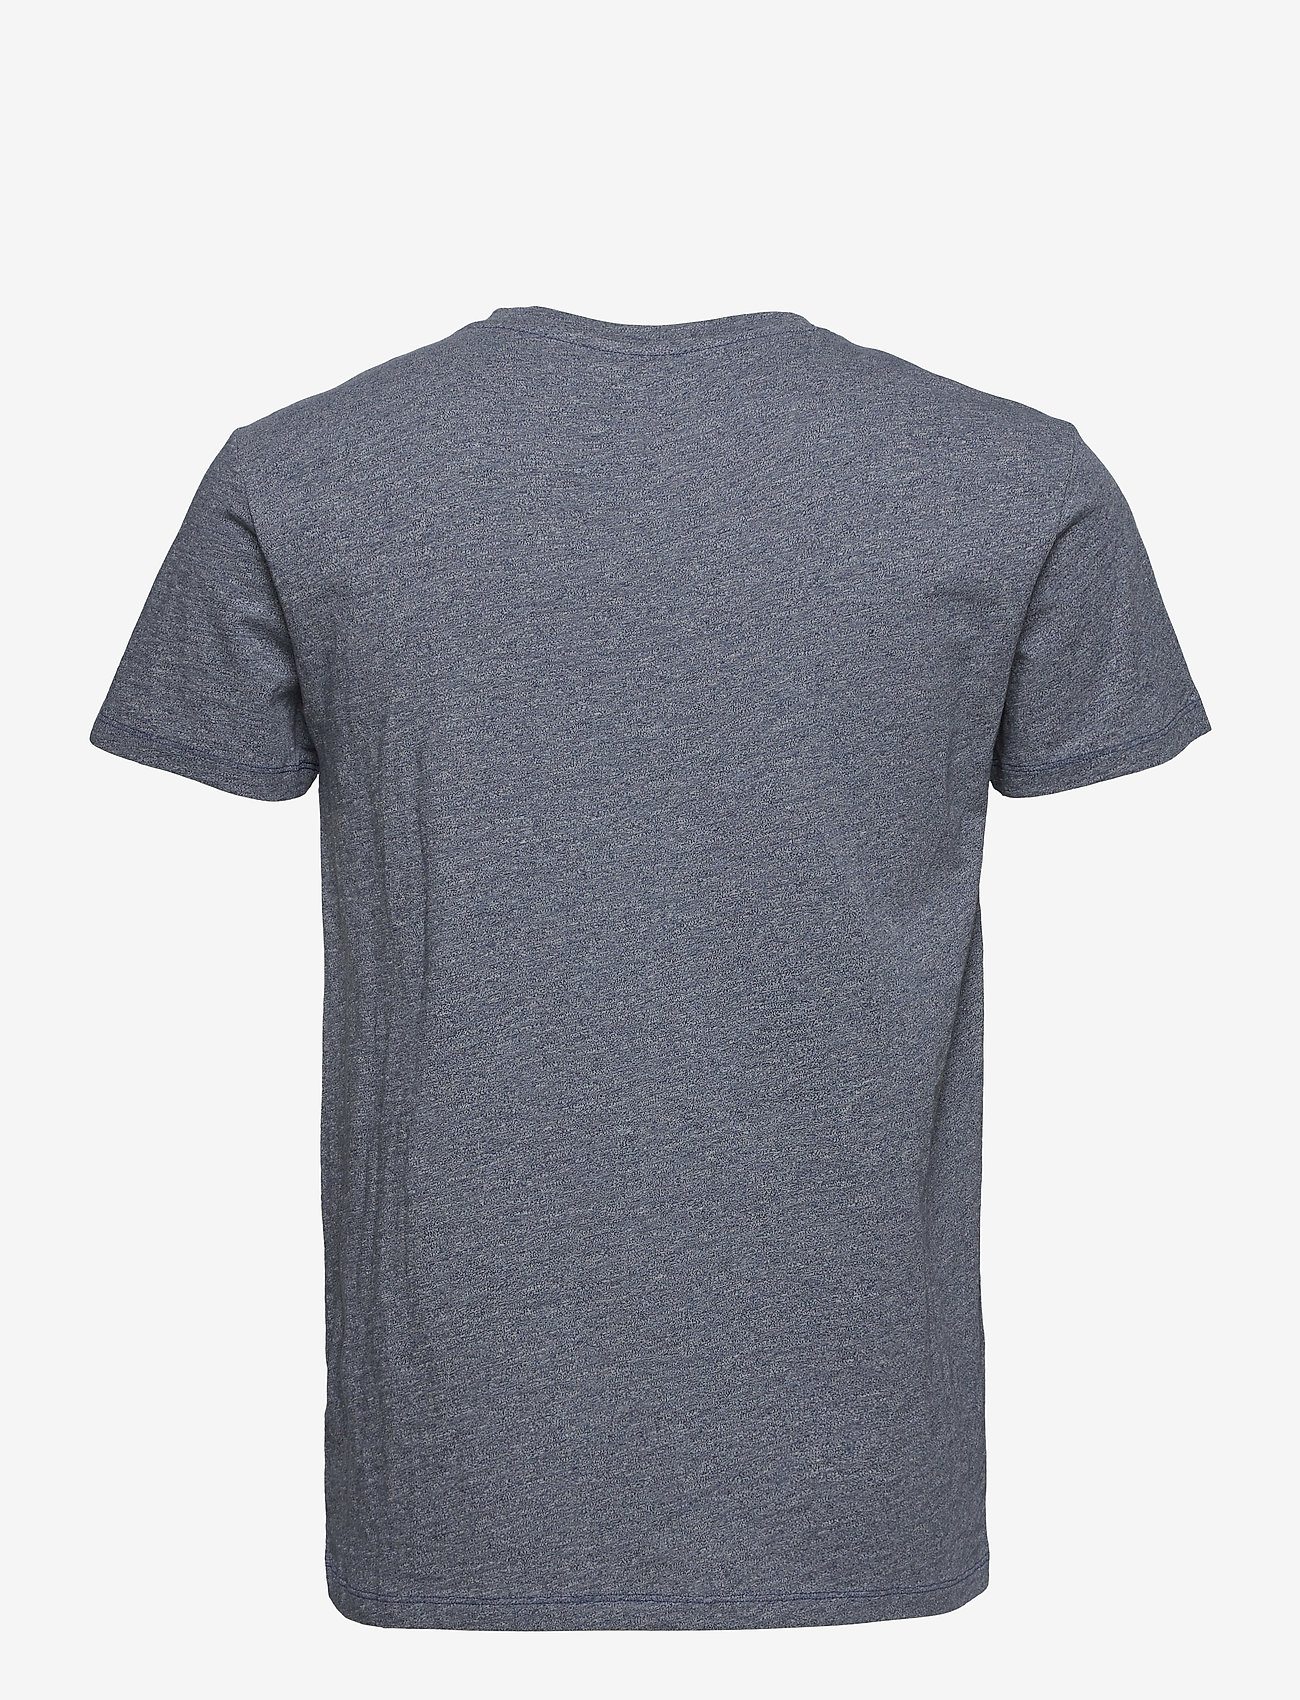 Lee Jeans - ULTIMATE POCKET TEE - basic t-shirts - piscine - 1